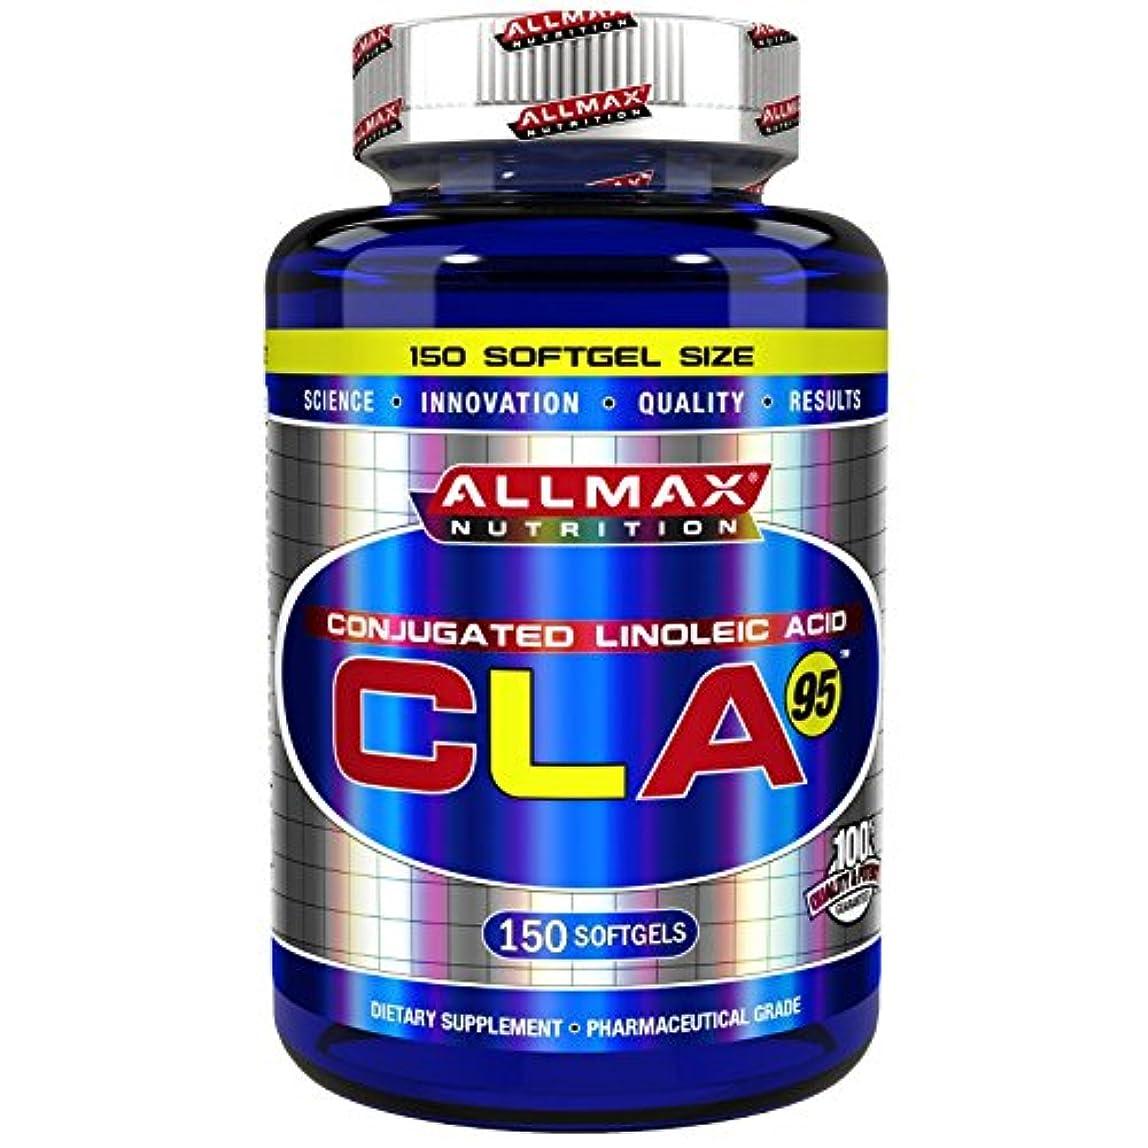 兄庭園宴会海外直送品 Allmax Nutrition CLA 95 150 Softgels